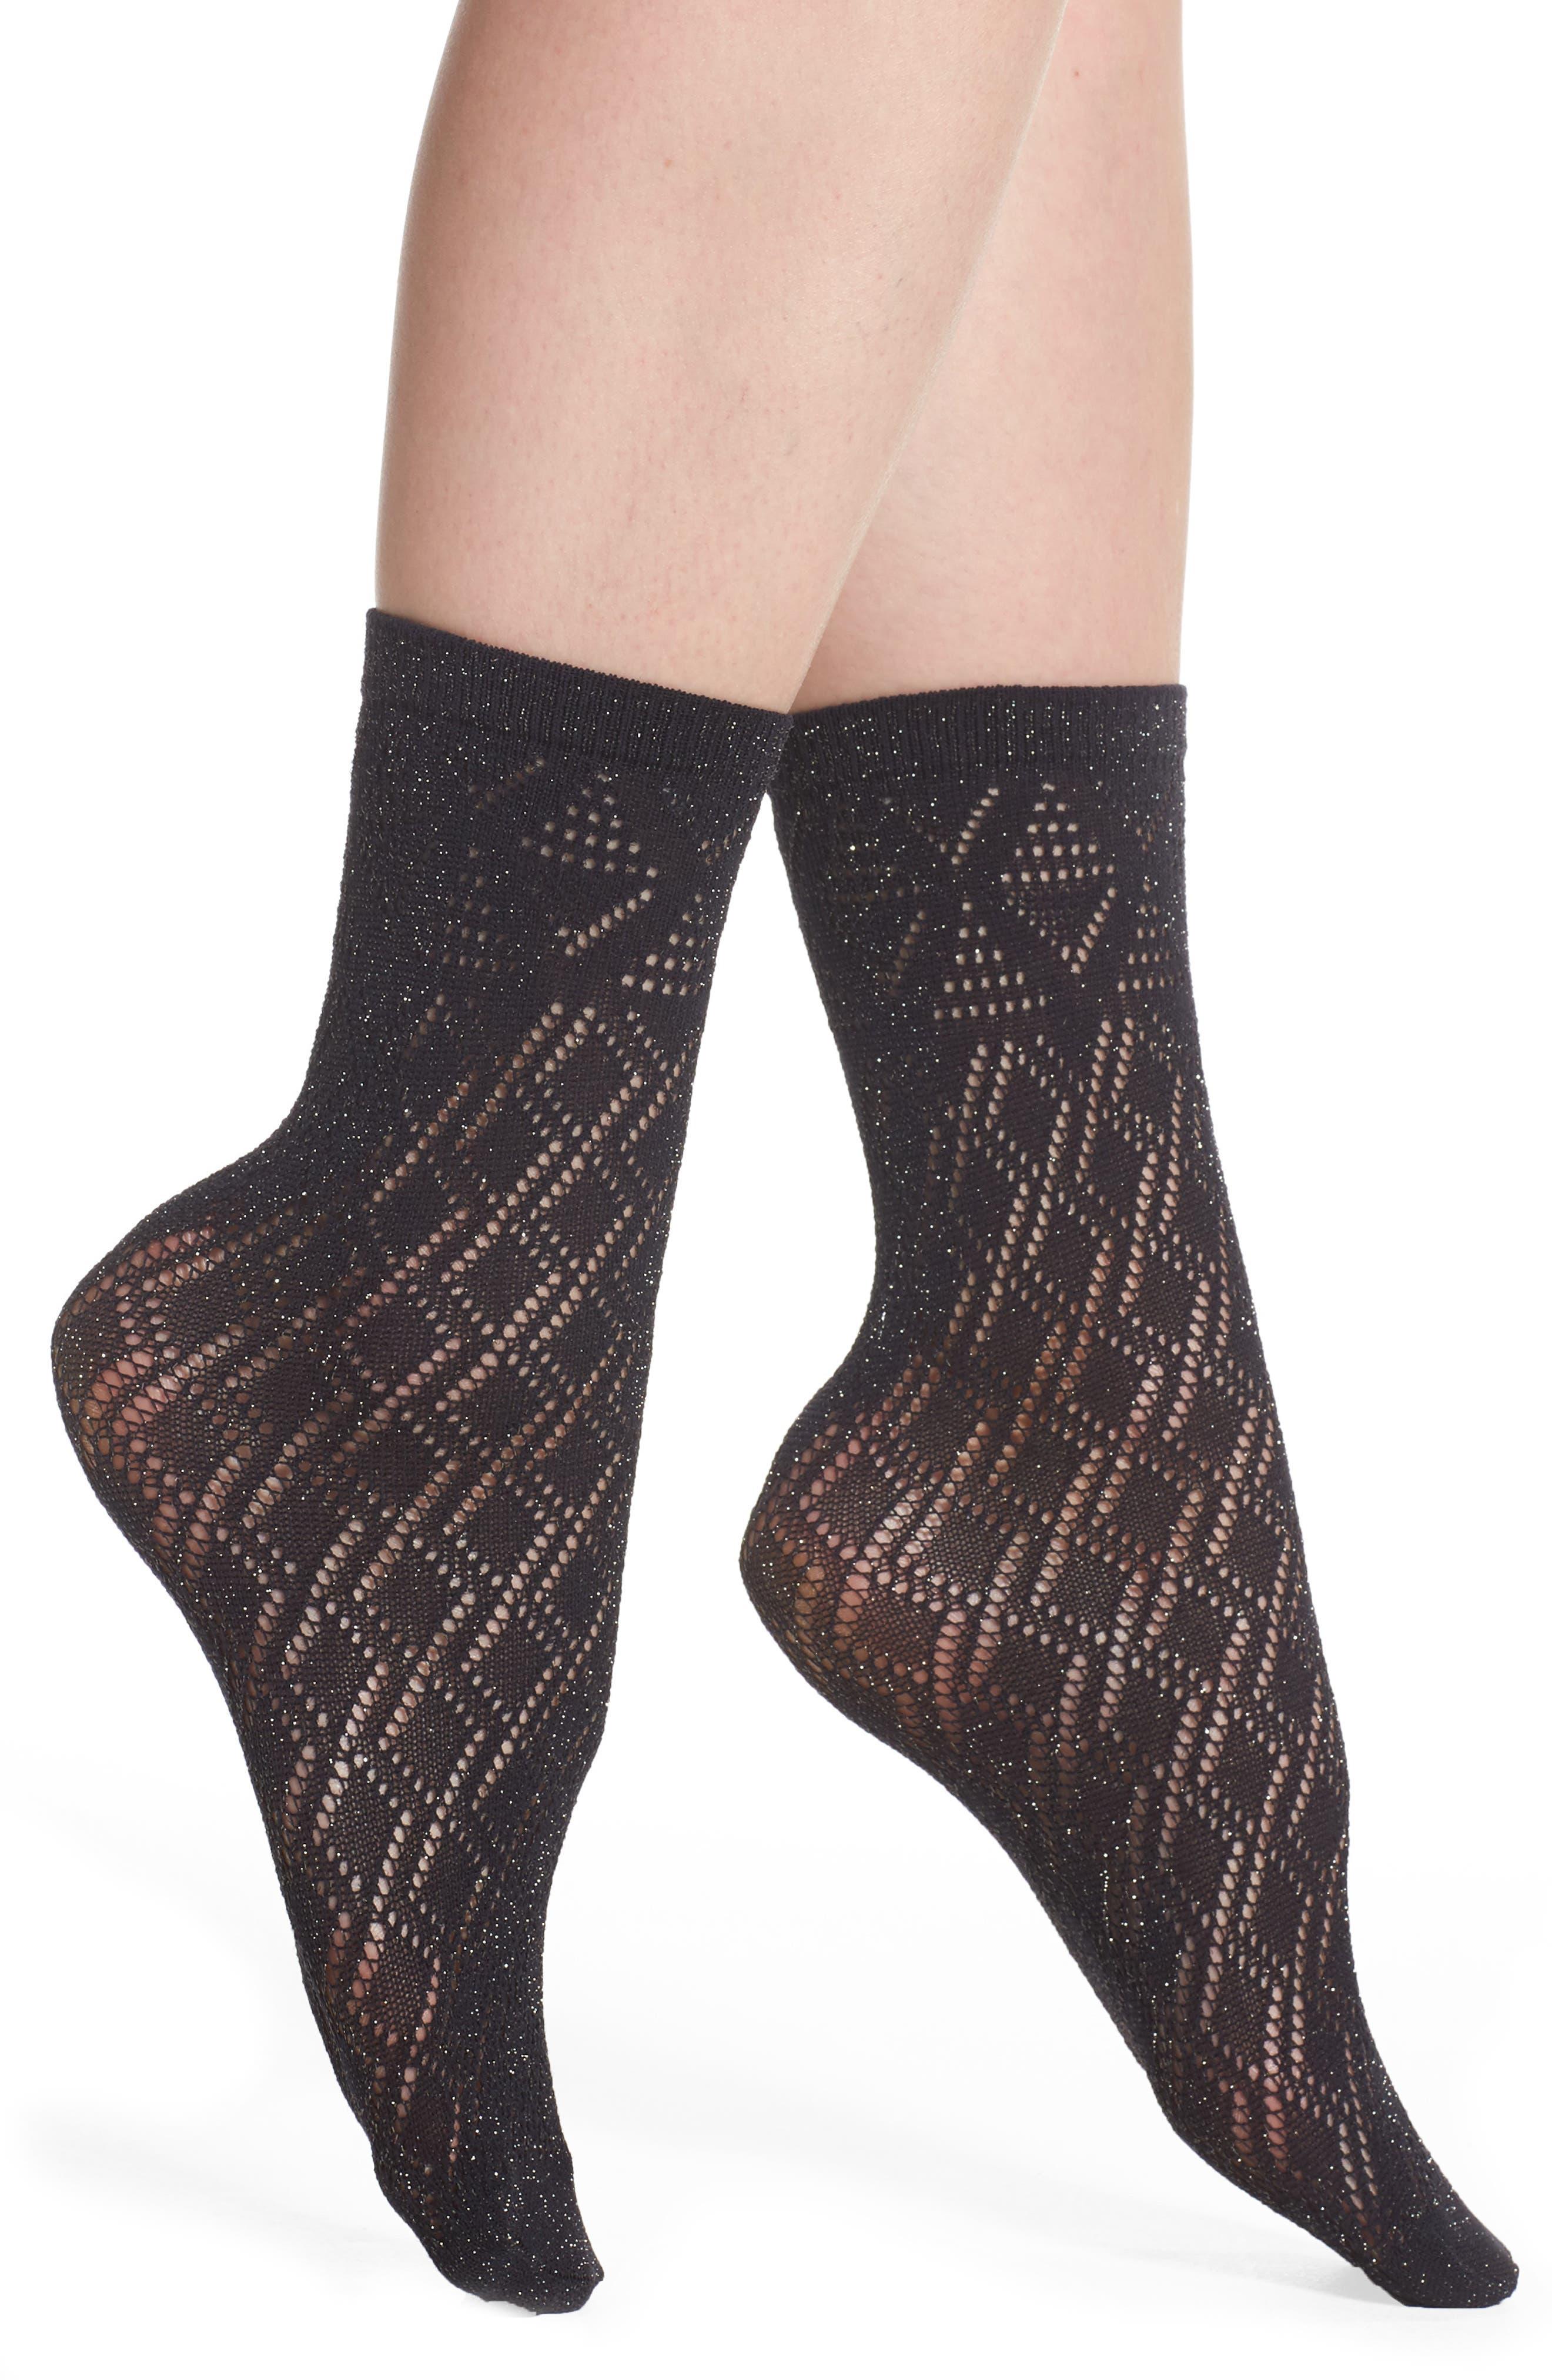 Kathy Trouser Socks,                             Main thumbnail 1, color,                             001